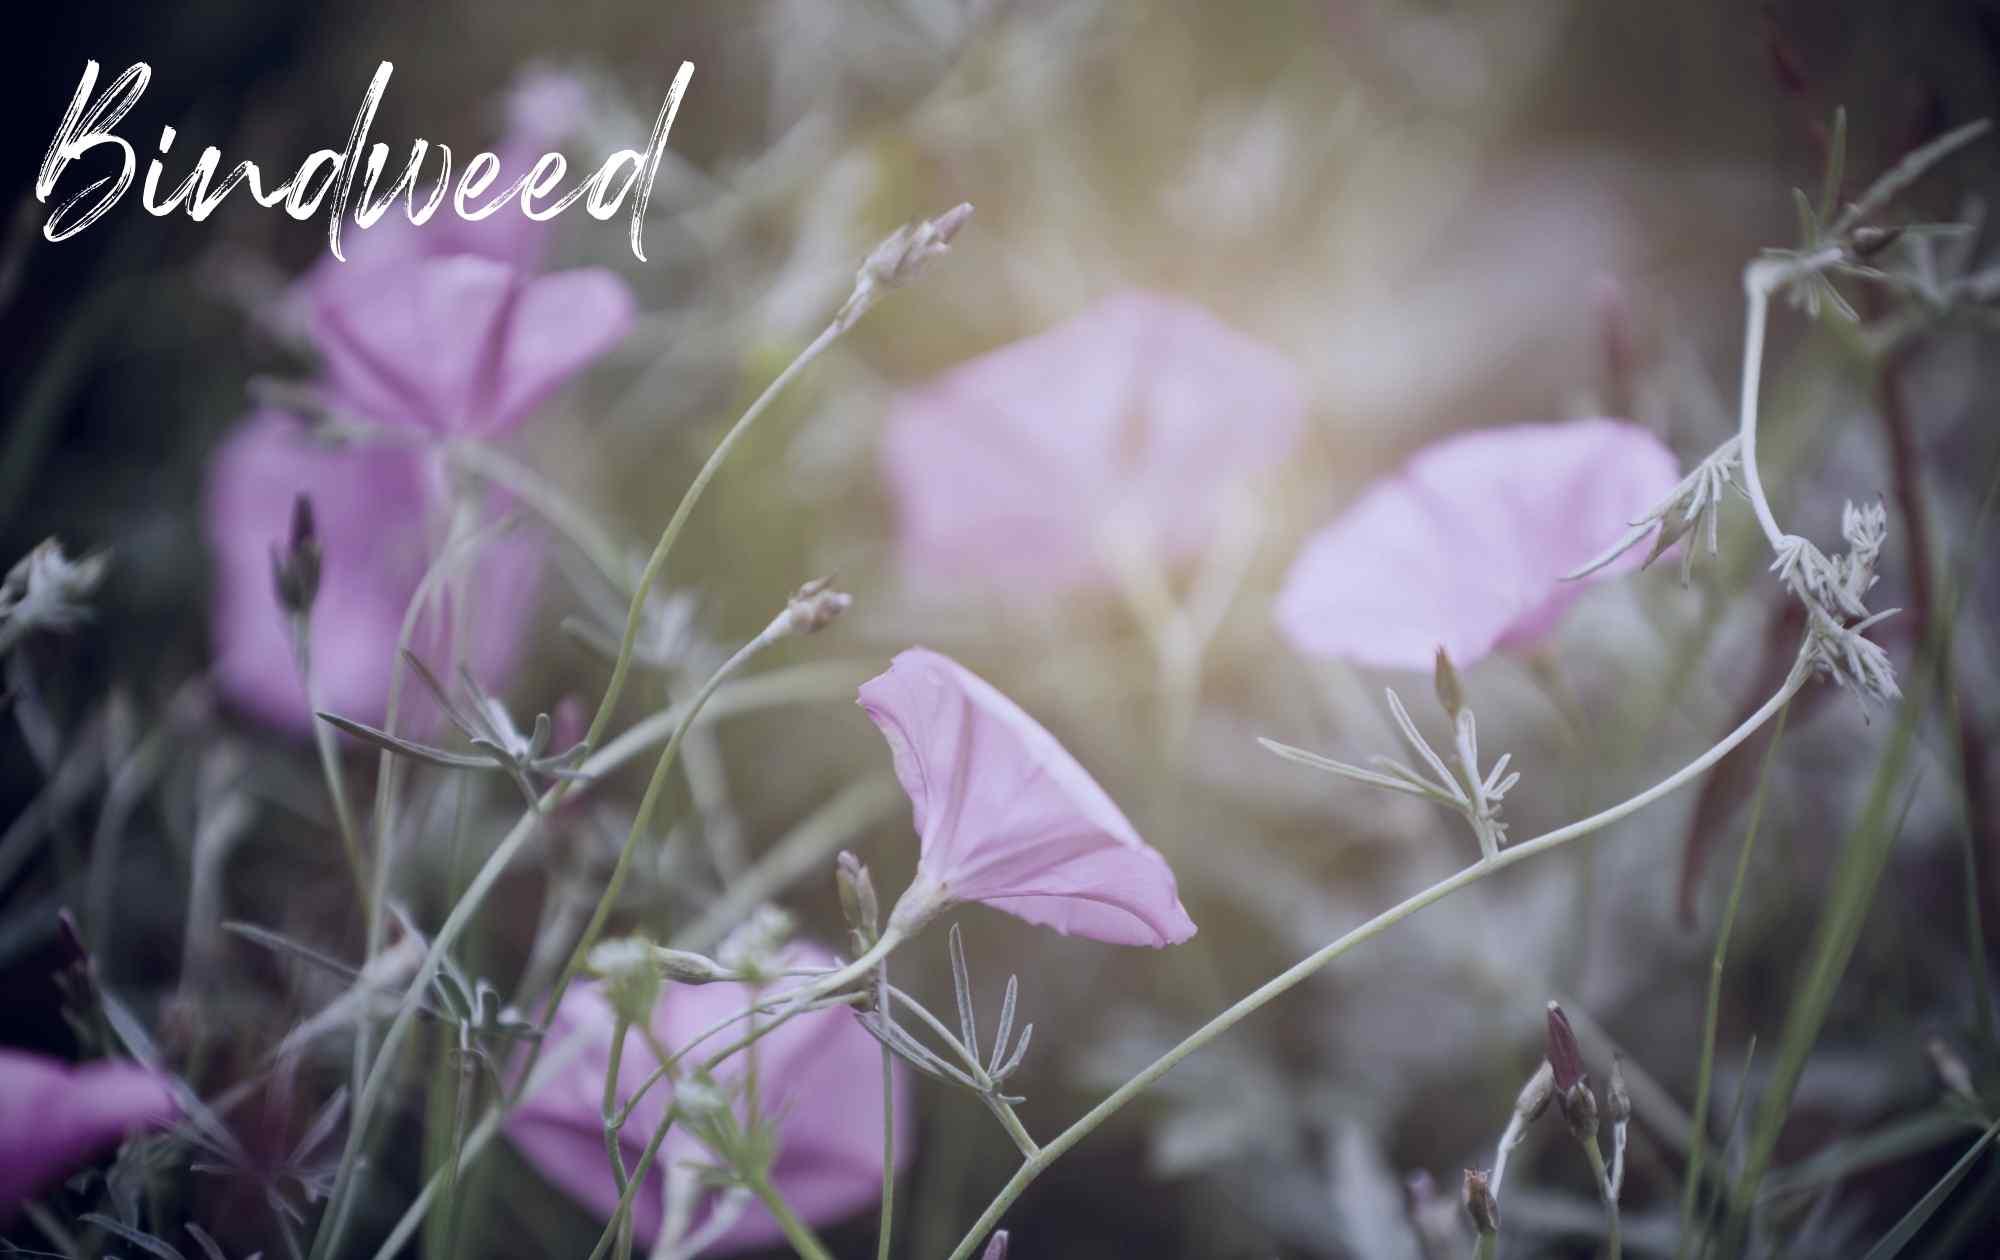 Bindweed landscape weed image